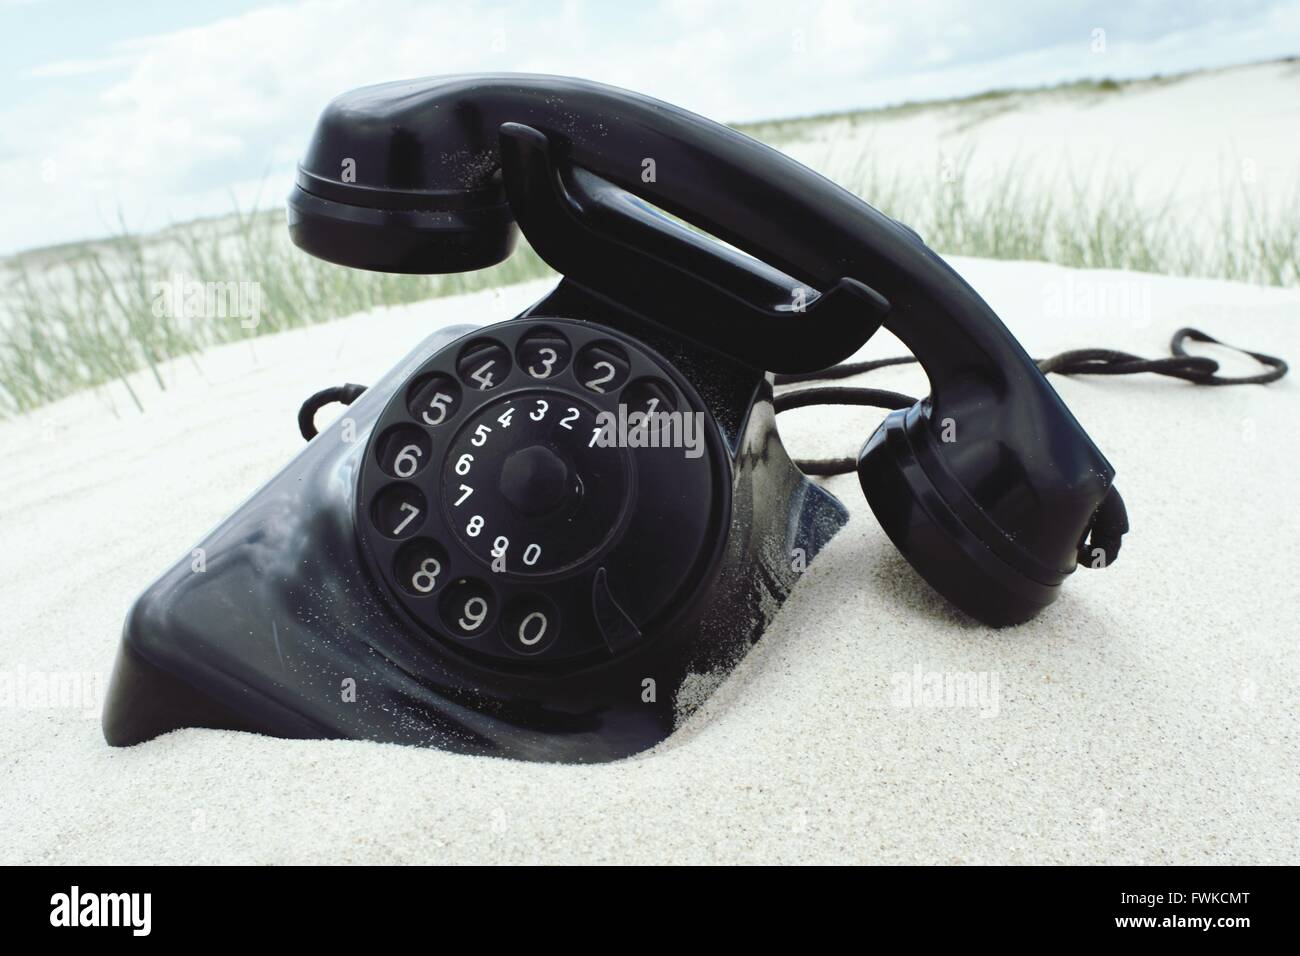 Close-Up Of Retro Telephone On Sand - Stock Image